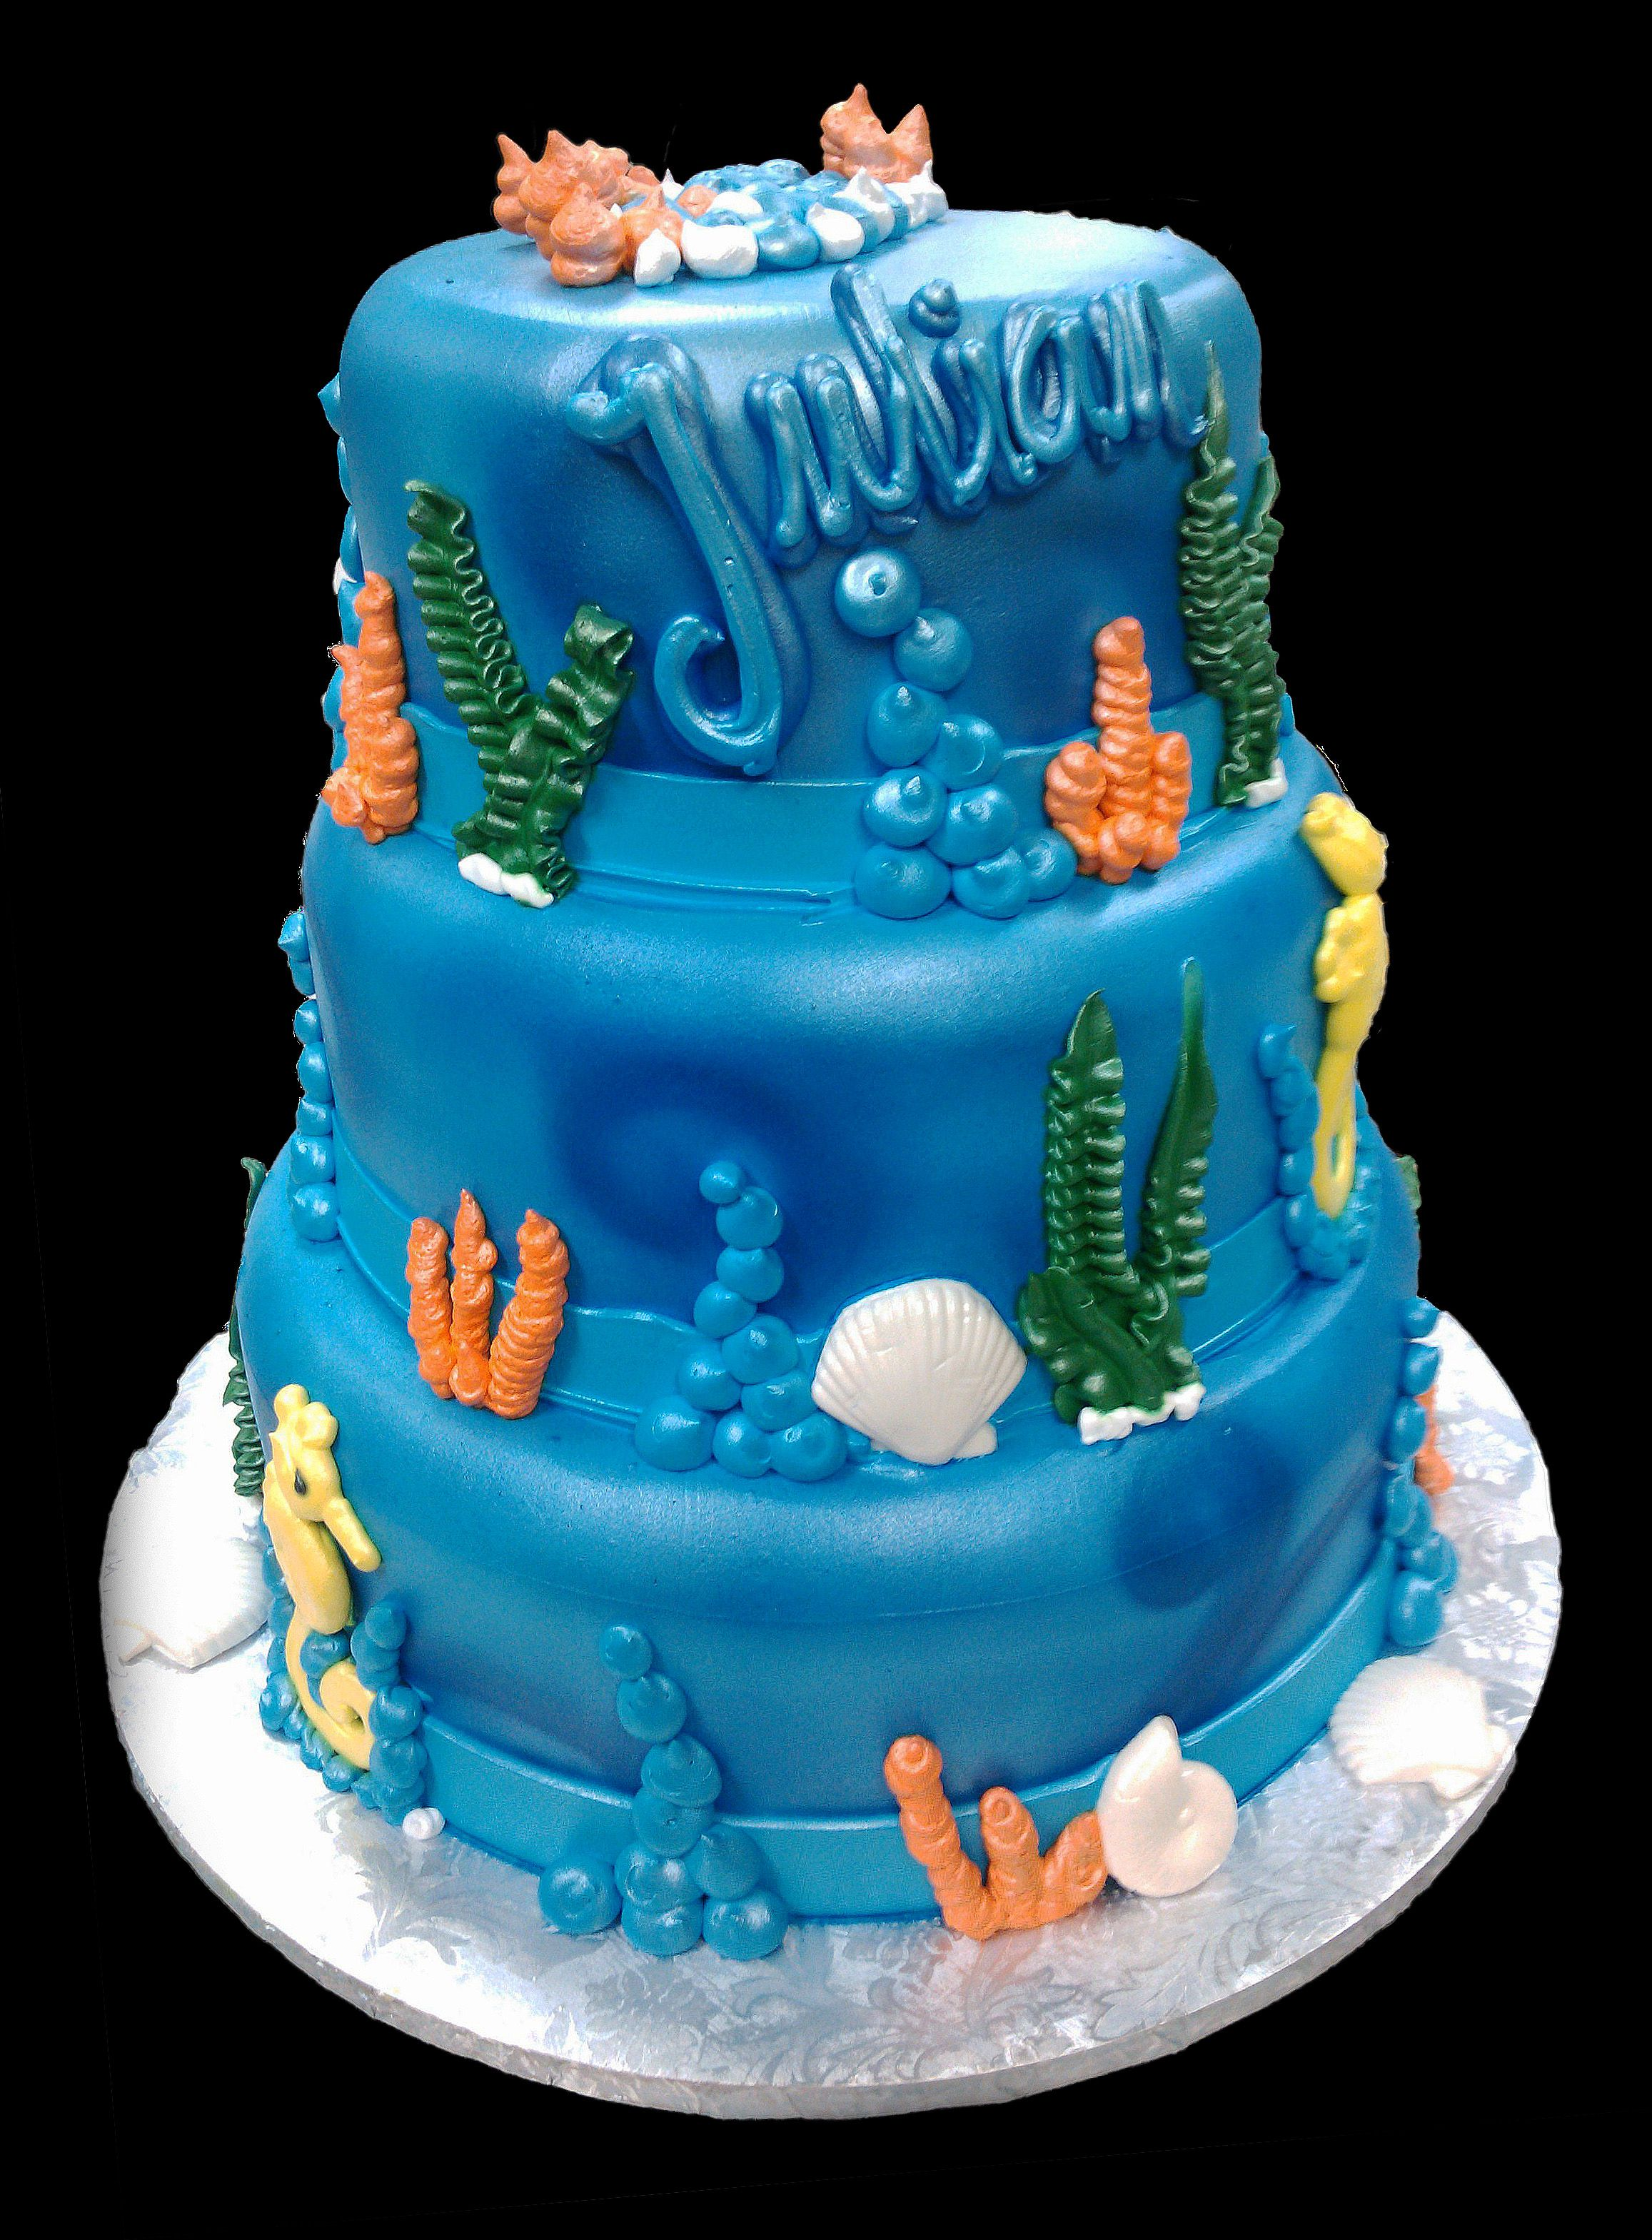 Custom Your Own Cake El Bolillo Bakery